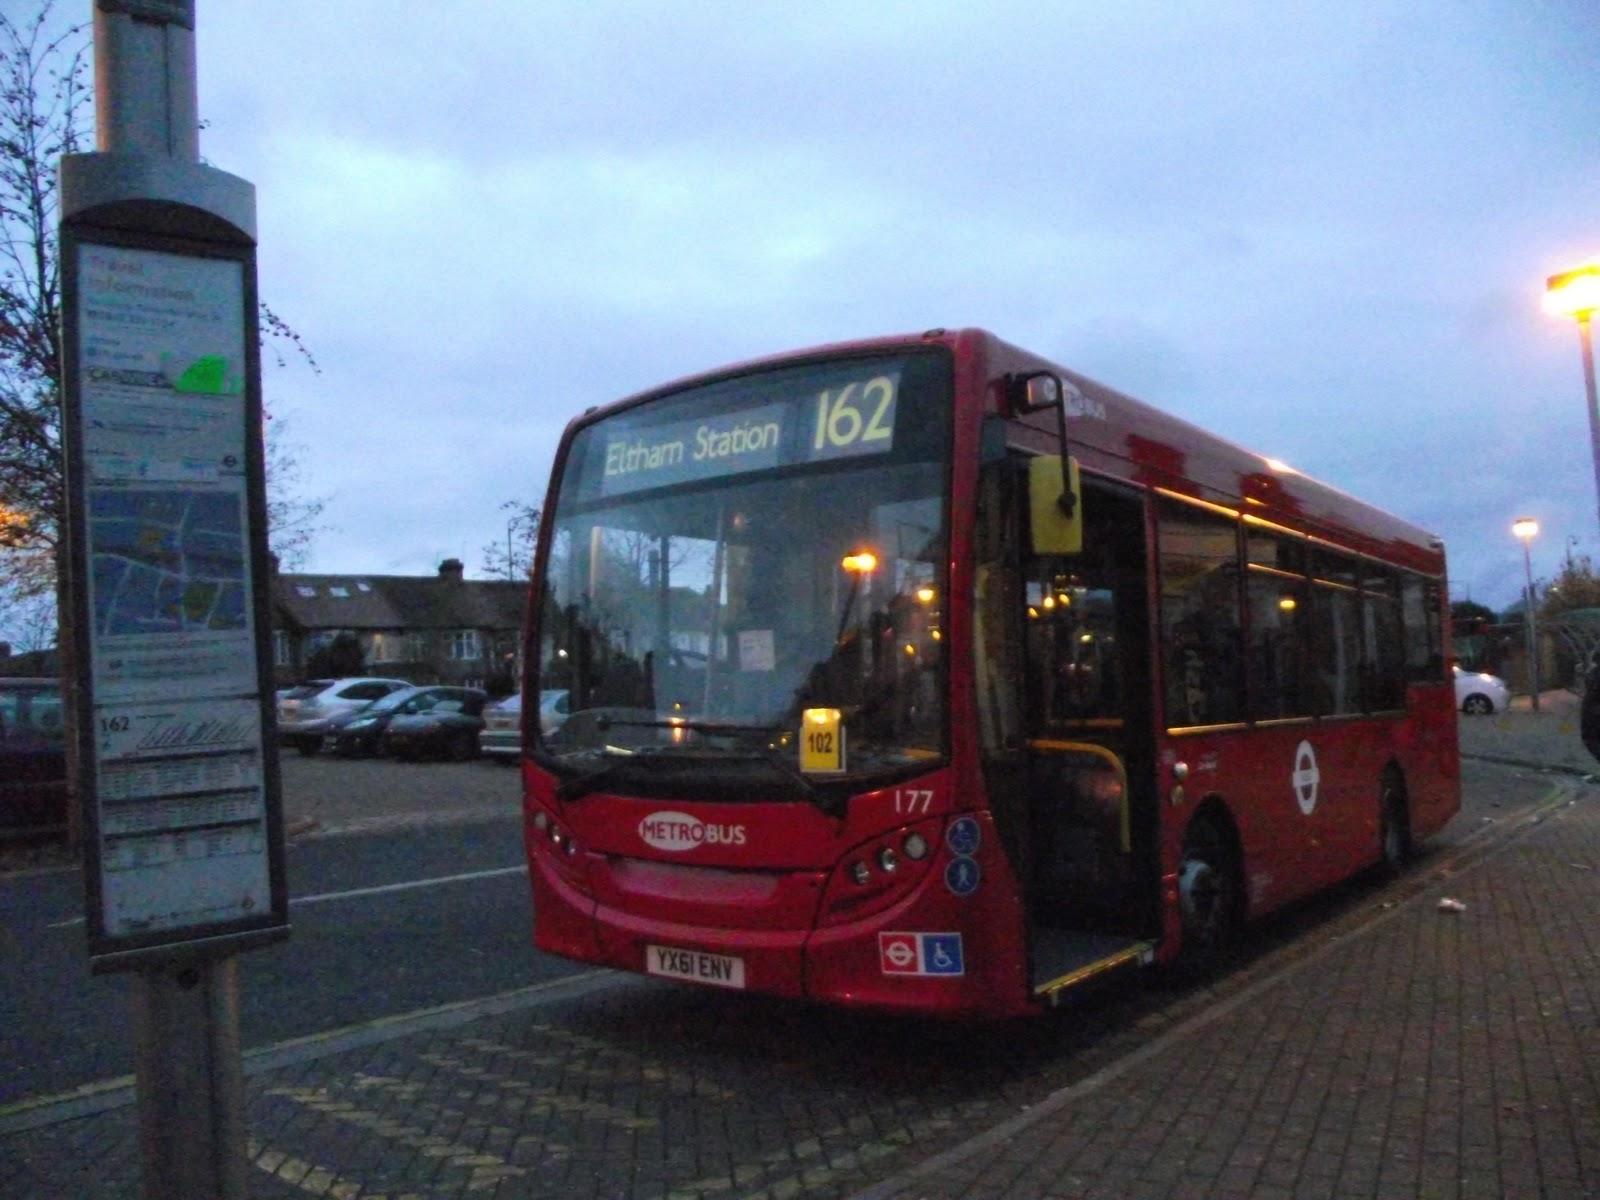 tom london & surrey bus blog: strange turns on route 162